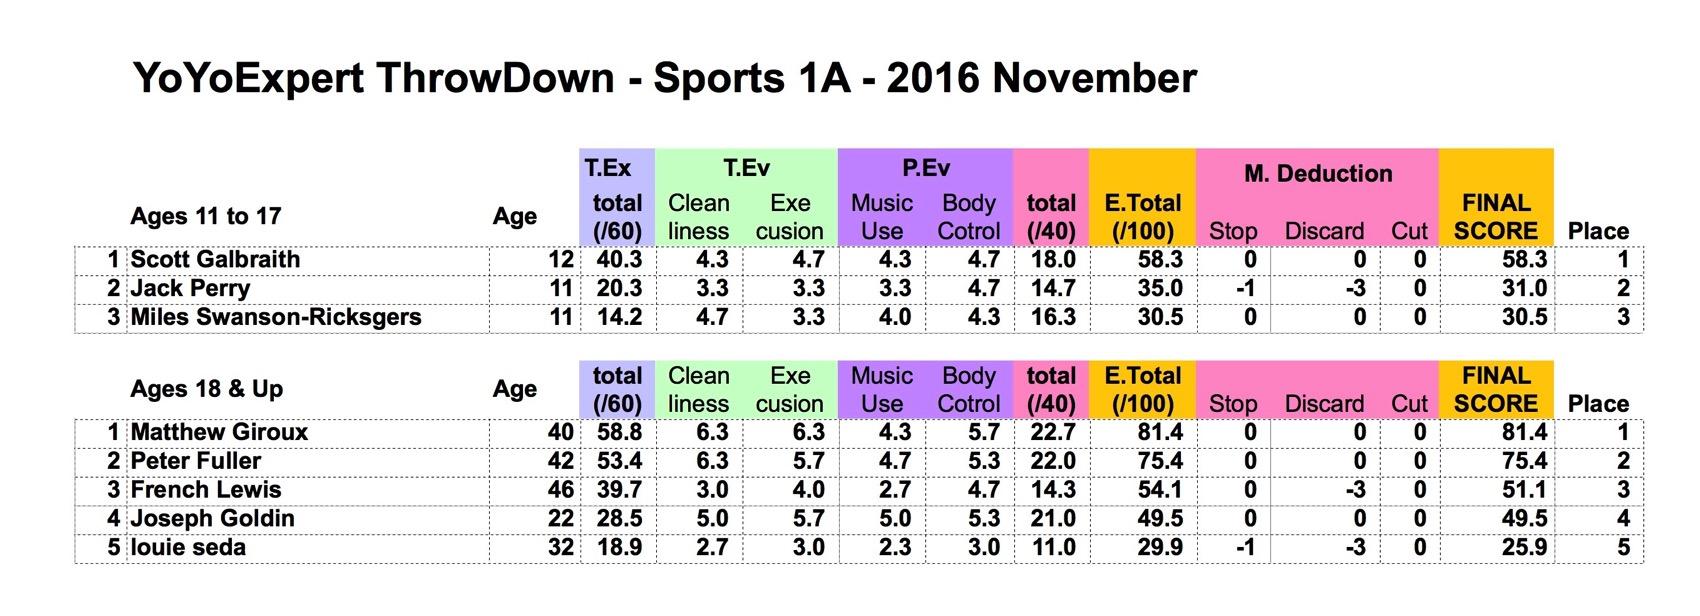 2016 November YoYoExpert ThrowDown SPORTS Results